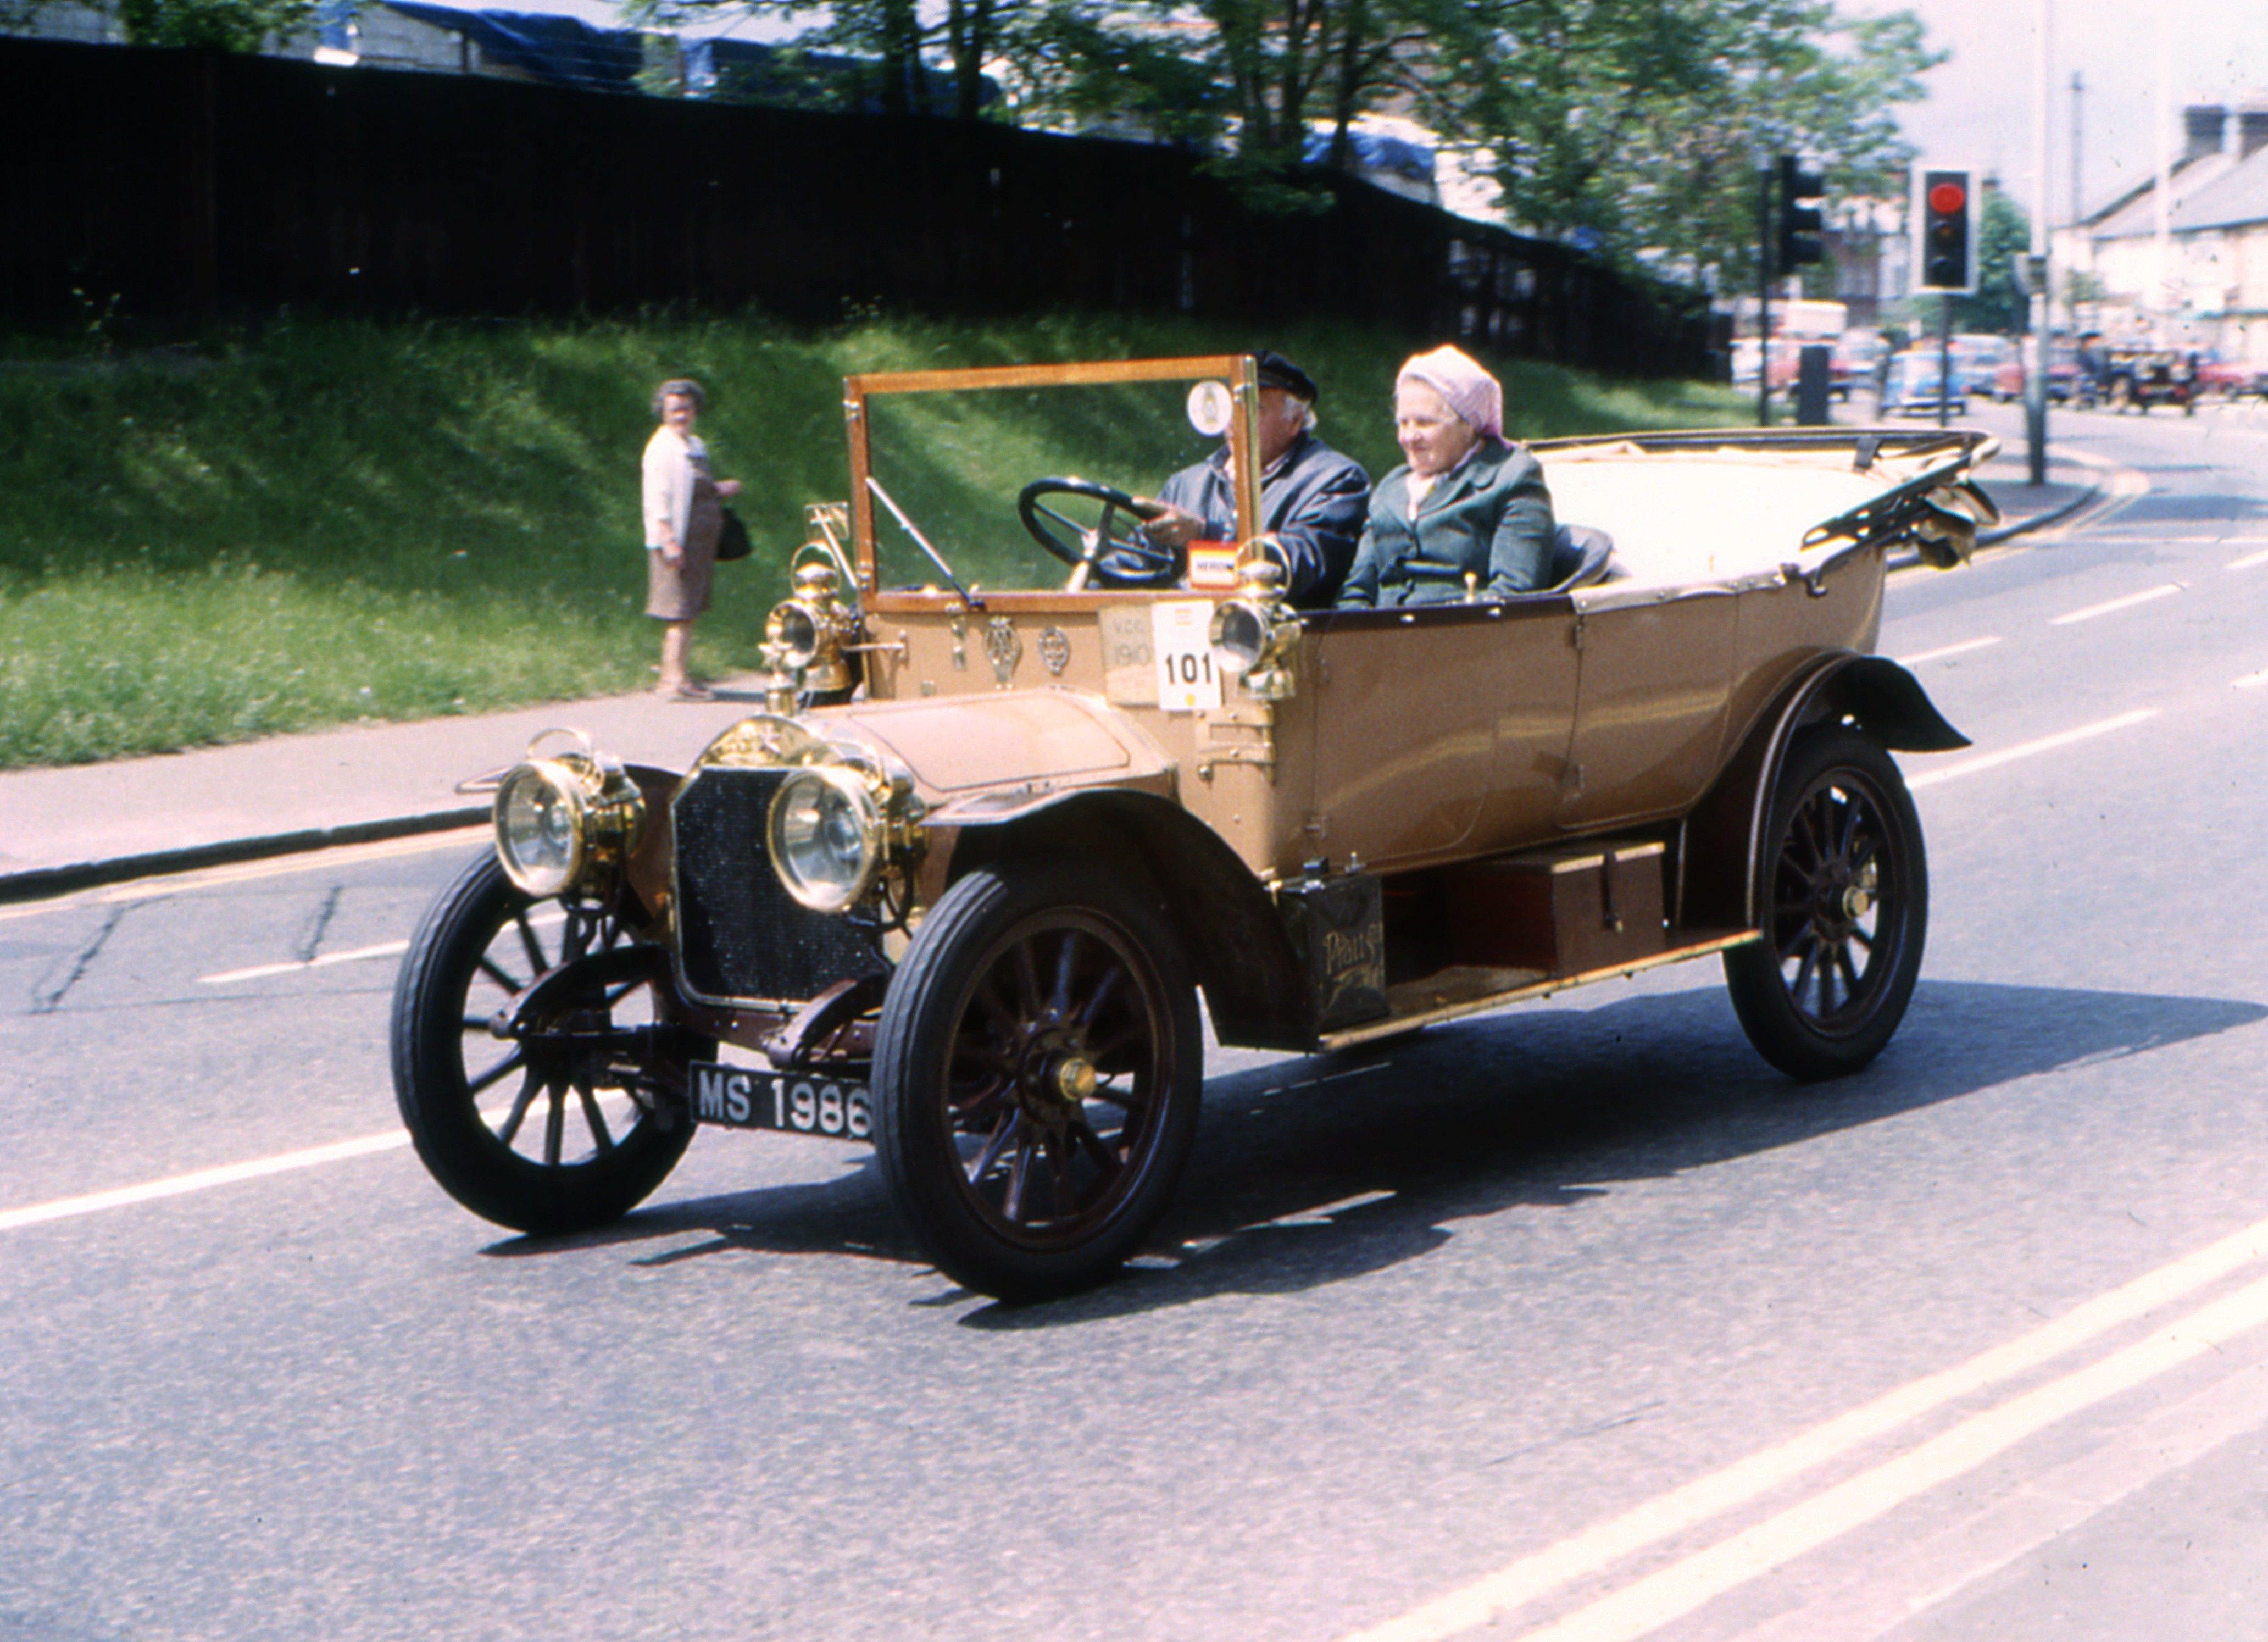 File:MS 1986, Veteran car run, Micklefield, High Wycombe, 1980.jpg ...